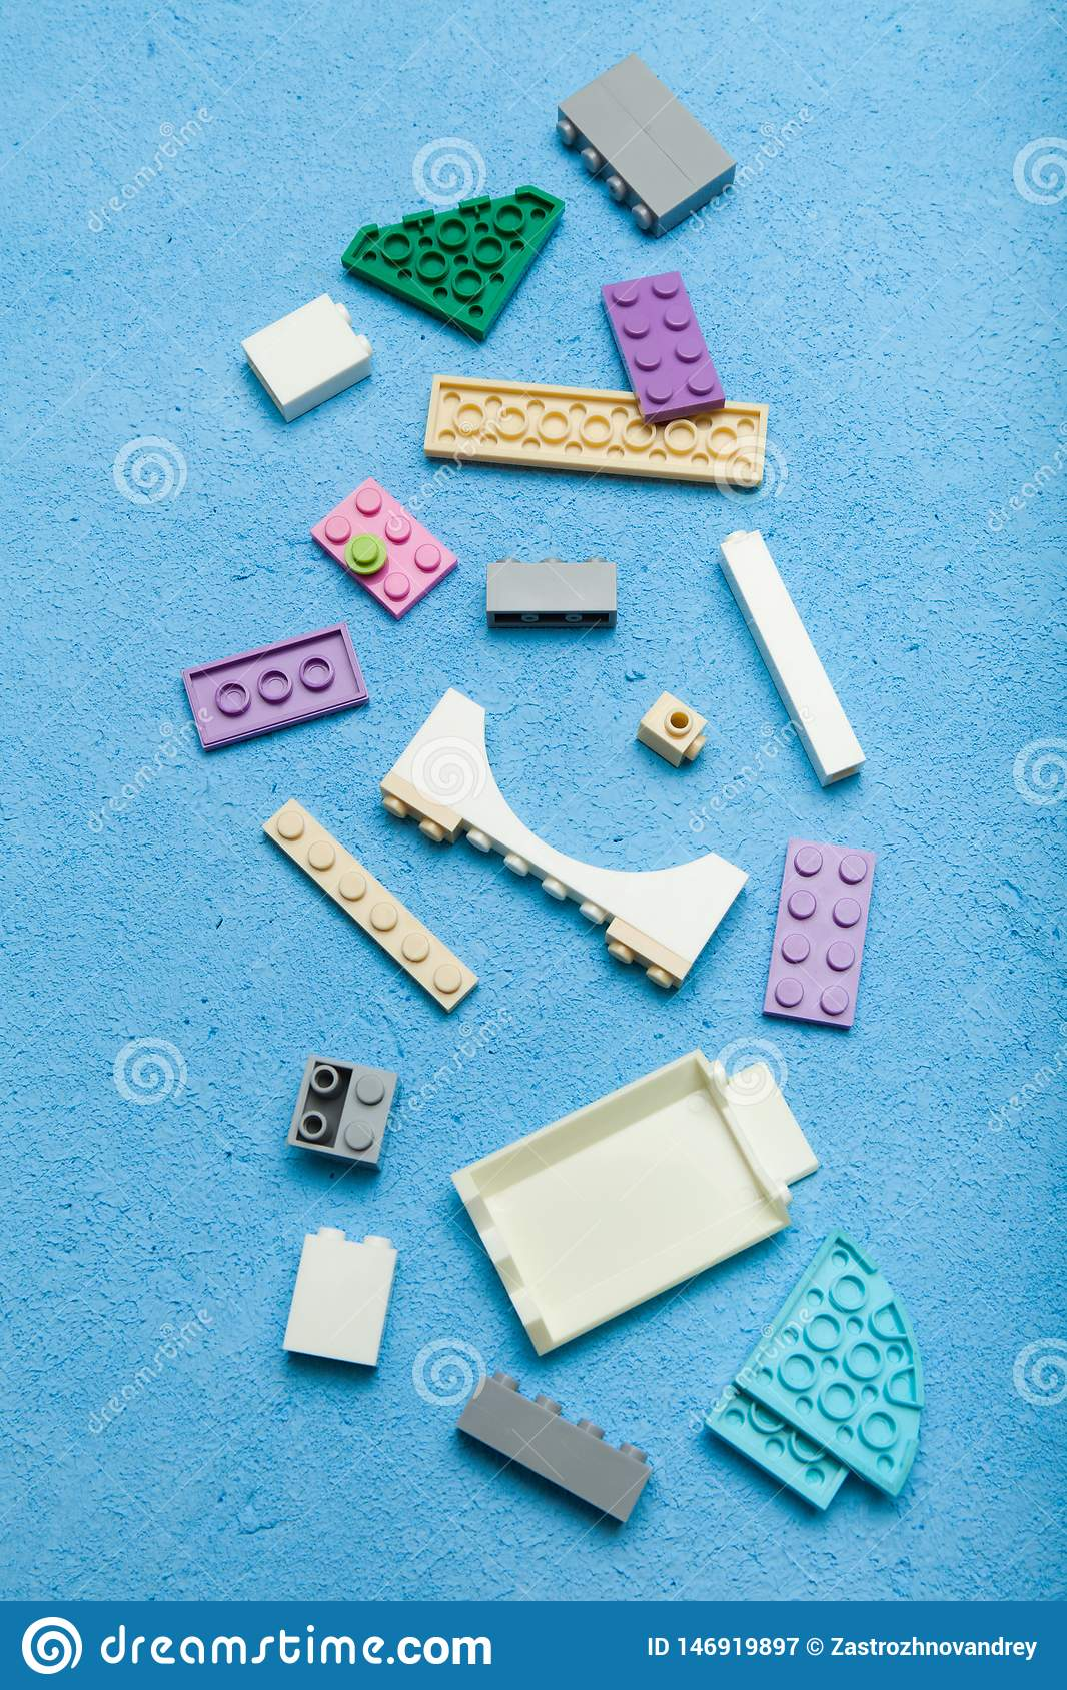 Colorful wood cube building blocks, vertical